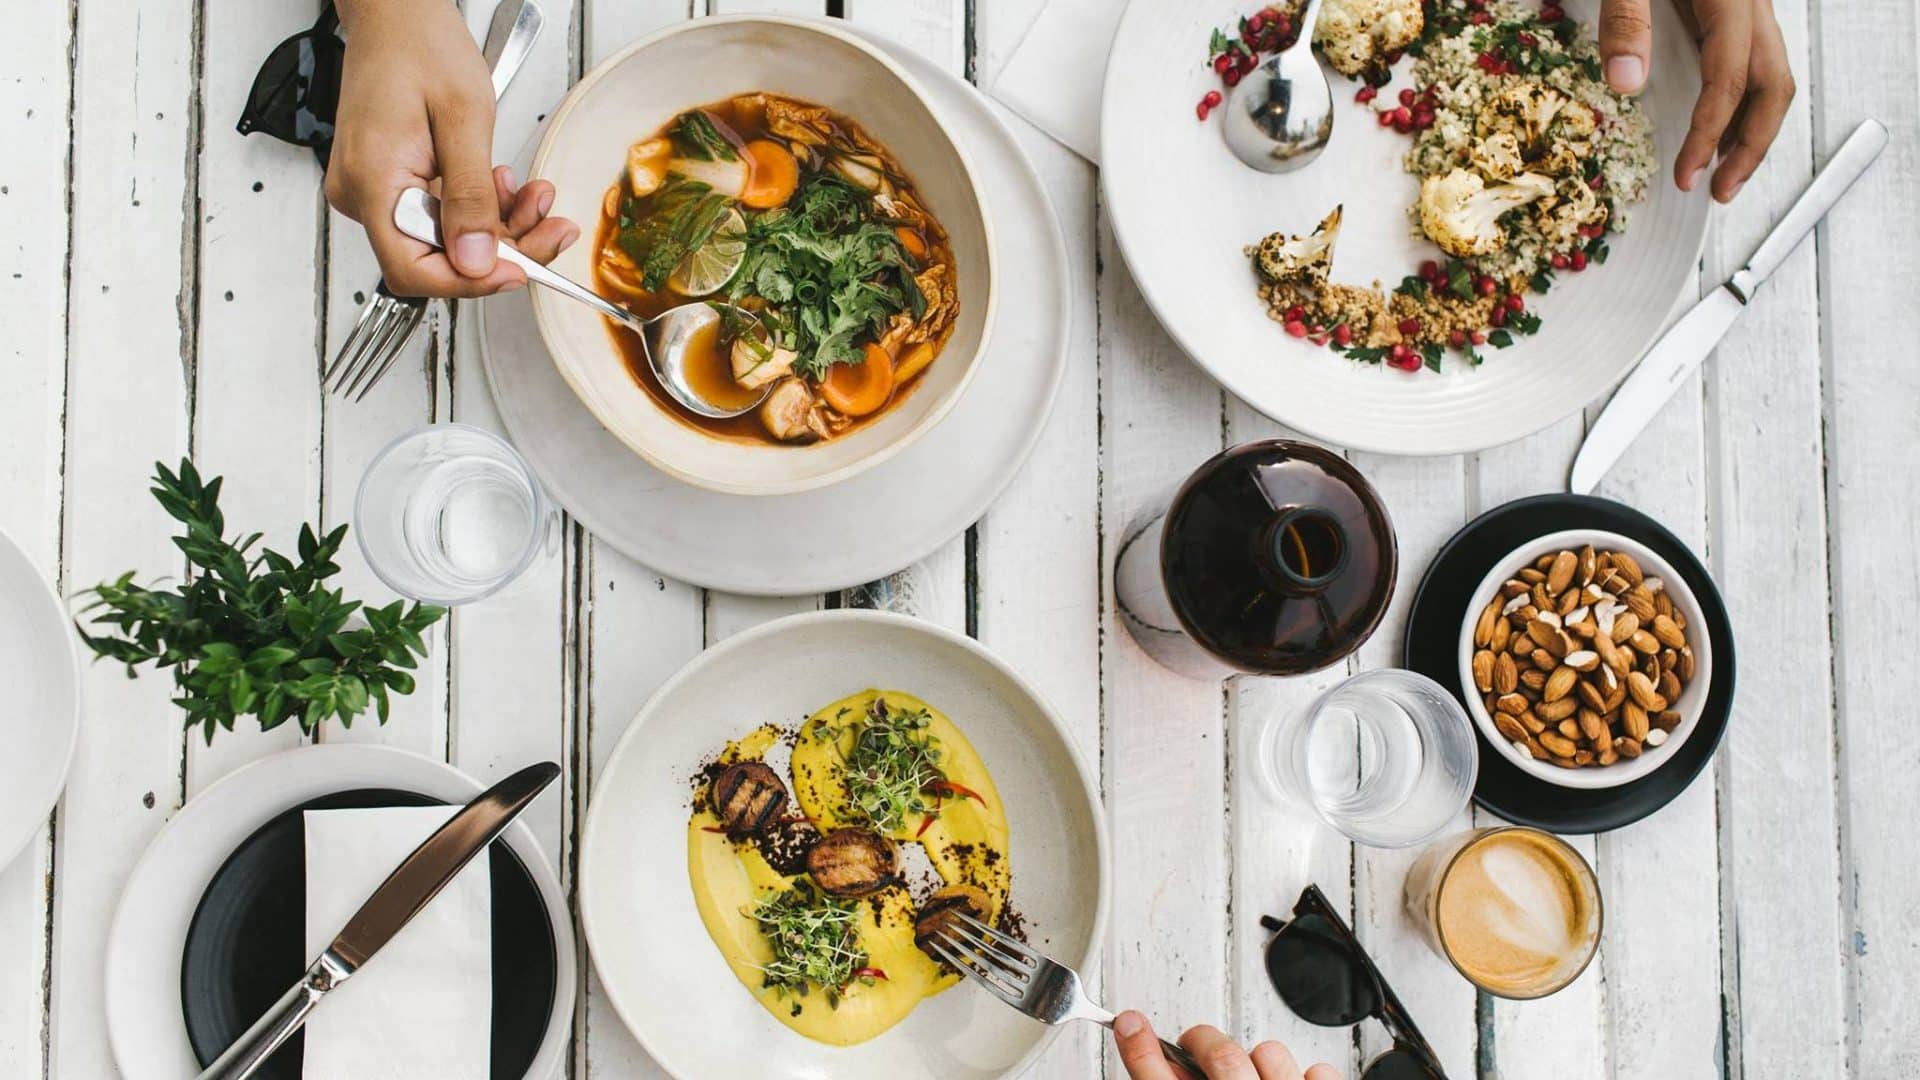 The 50 Best Vegan Restaurants in the World 2020